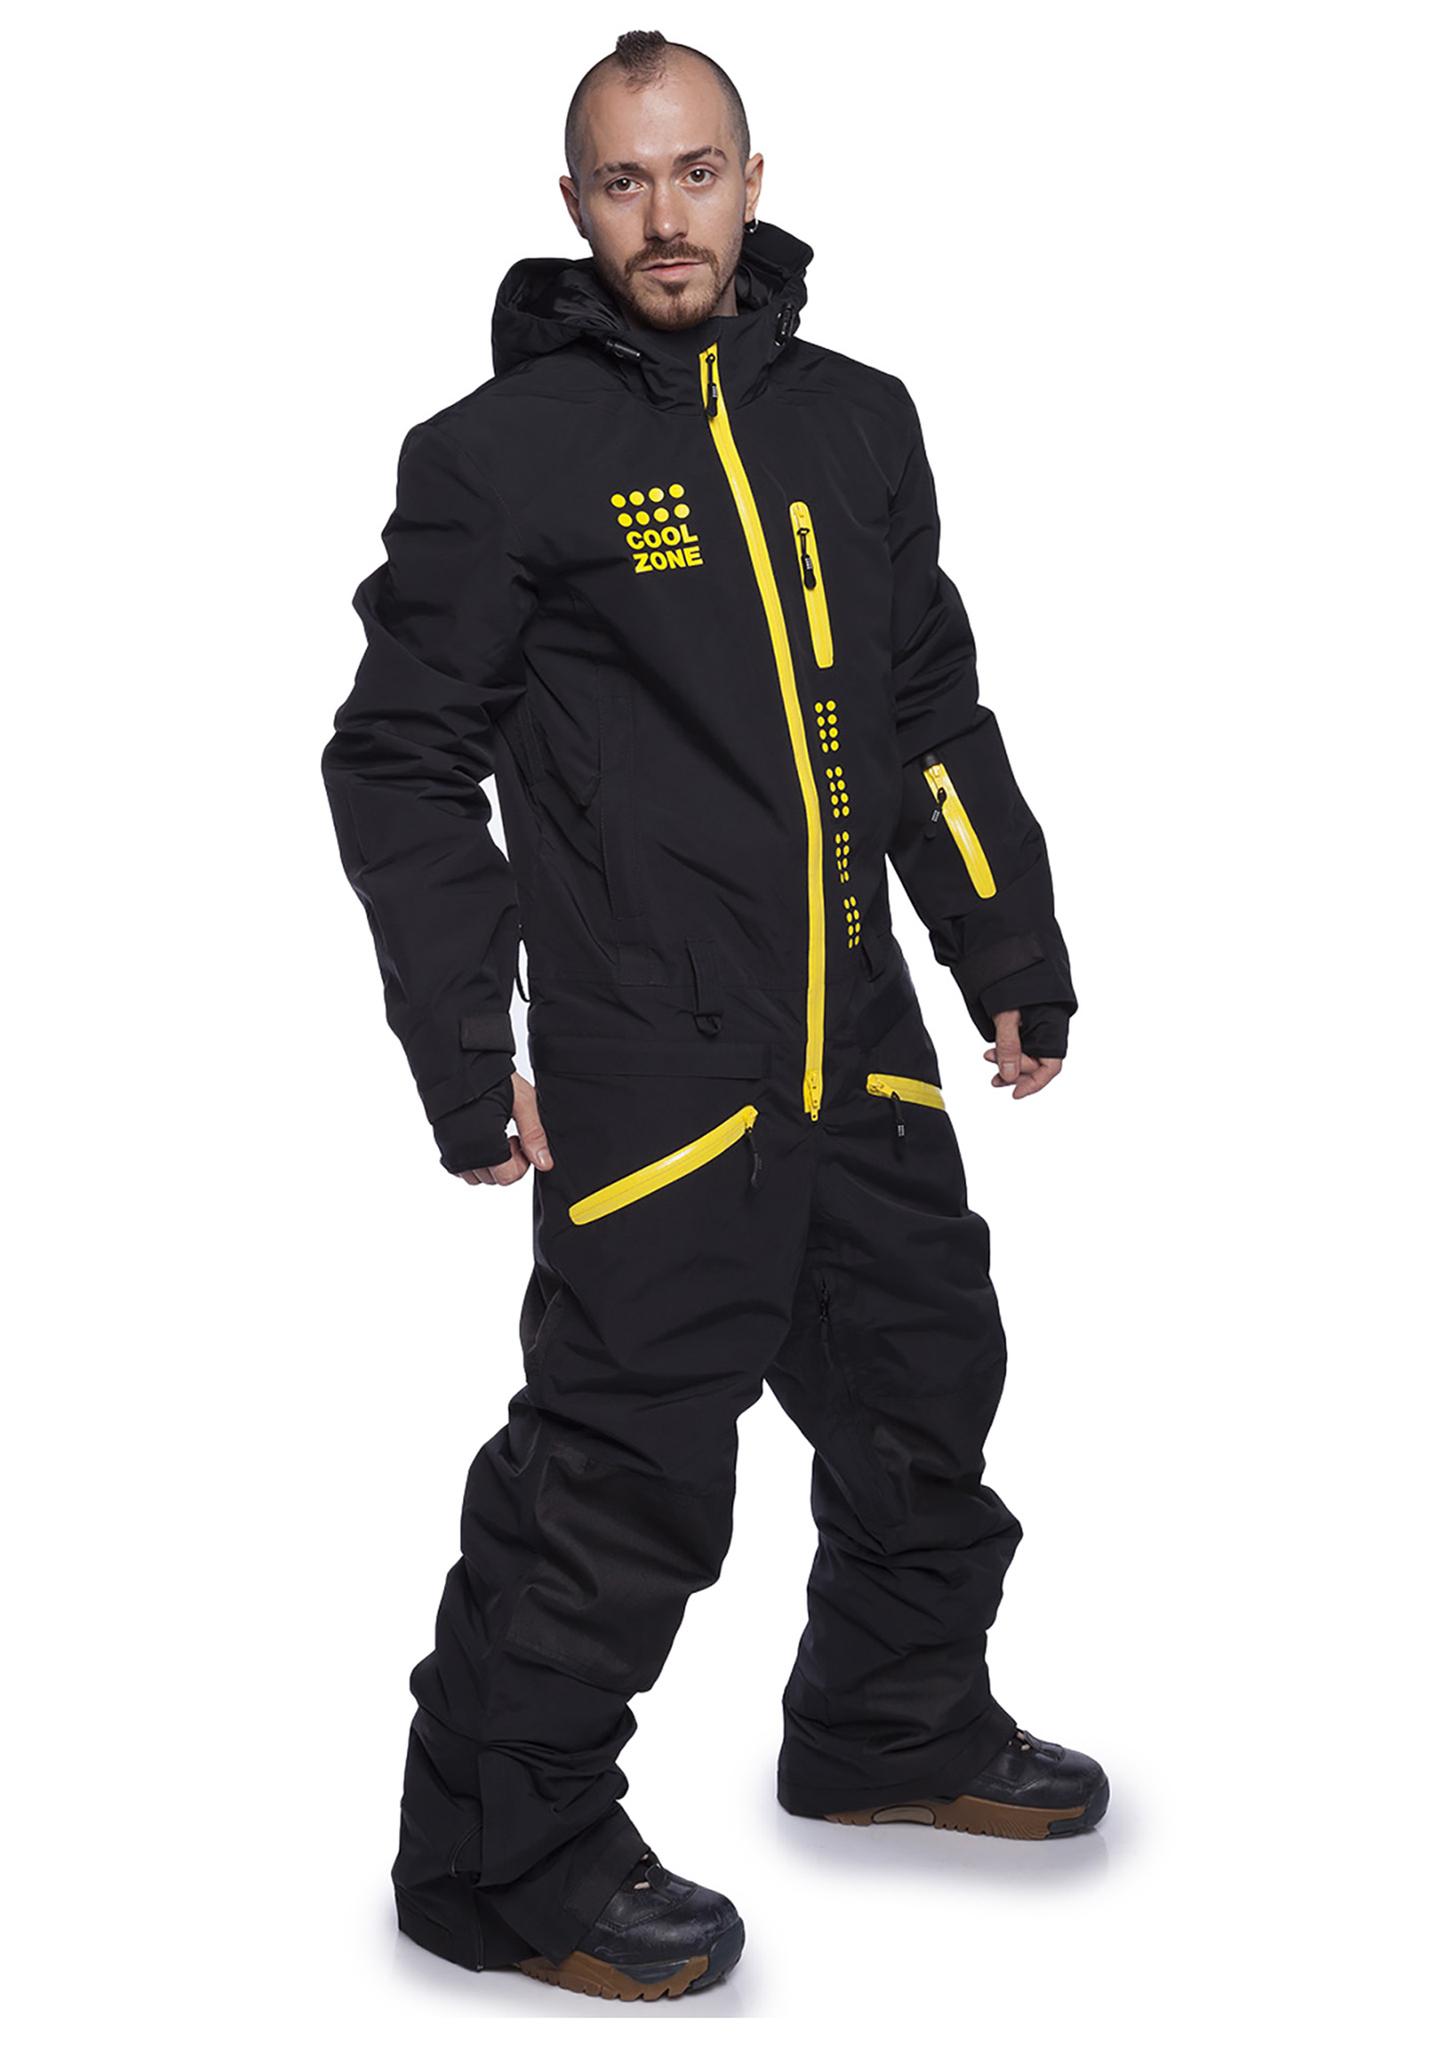 Утепленный комбинезон для мужчин Cool Zone Kite (Кул зон) черный для сноуборда и кайтинга фото